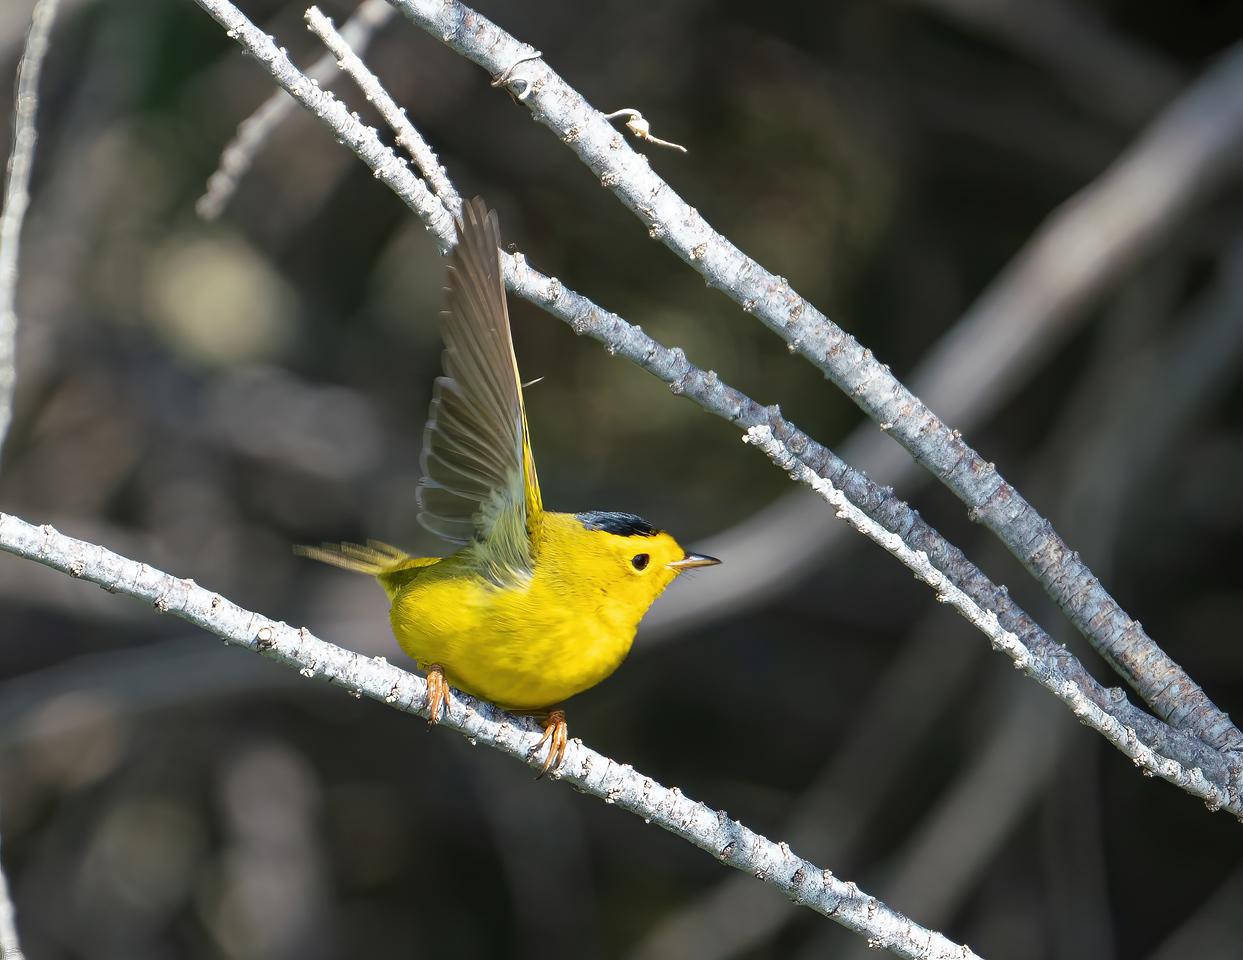 IMAGE: https://photos.smugmug.com/Beautyinthetreesandintheair/Birds/i-W6TMCfB/0/c6cd2dbc/X2/Wilson%27s%20warbler_R3_4-24-21-10-X2.jpg